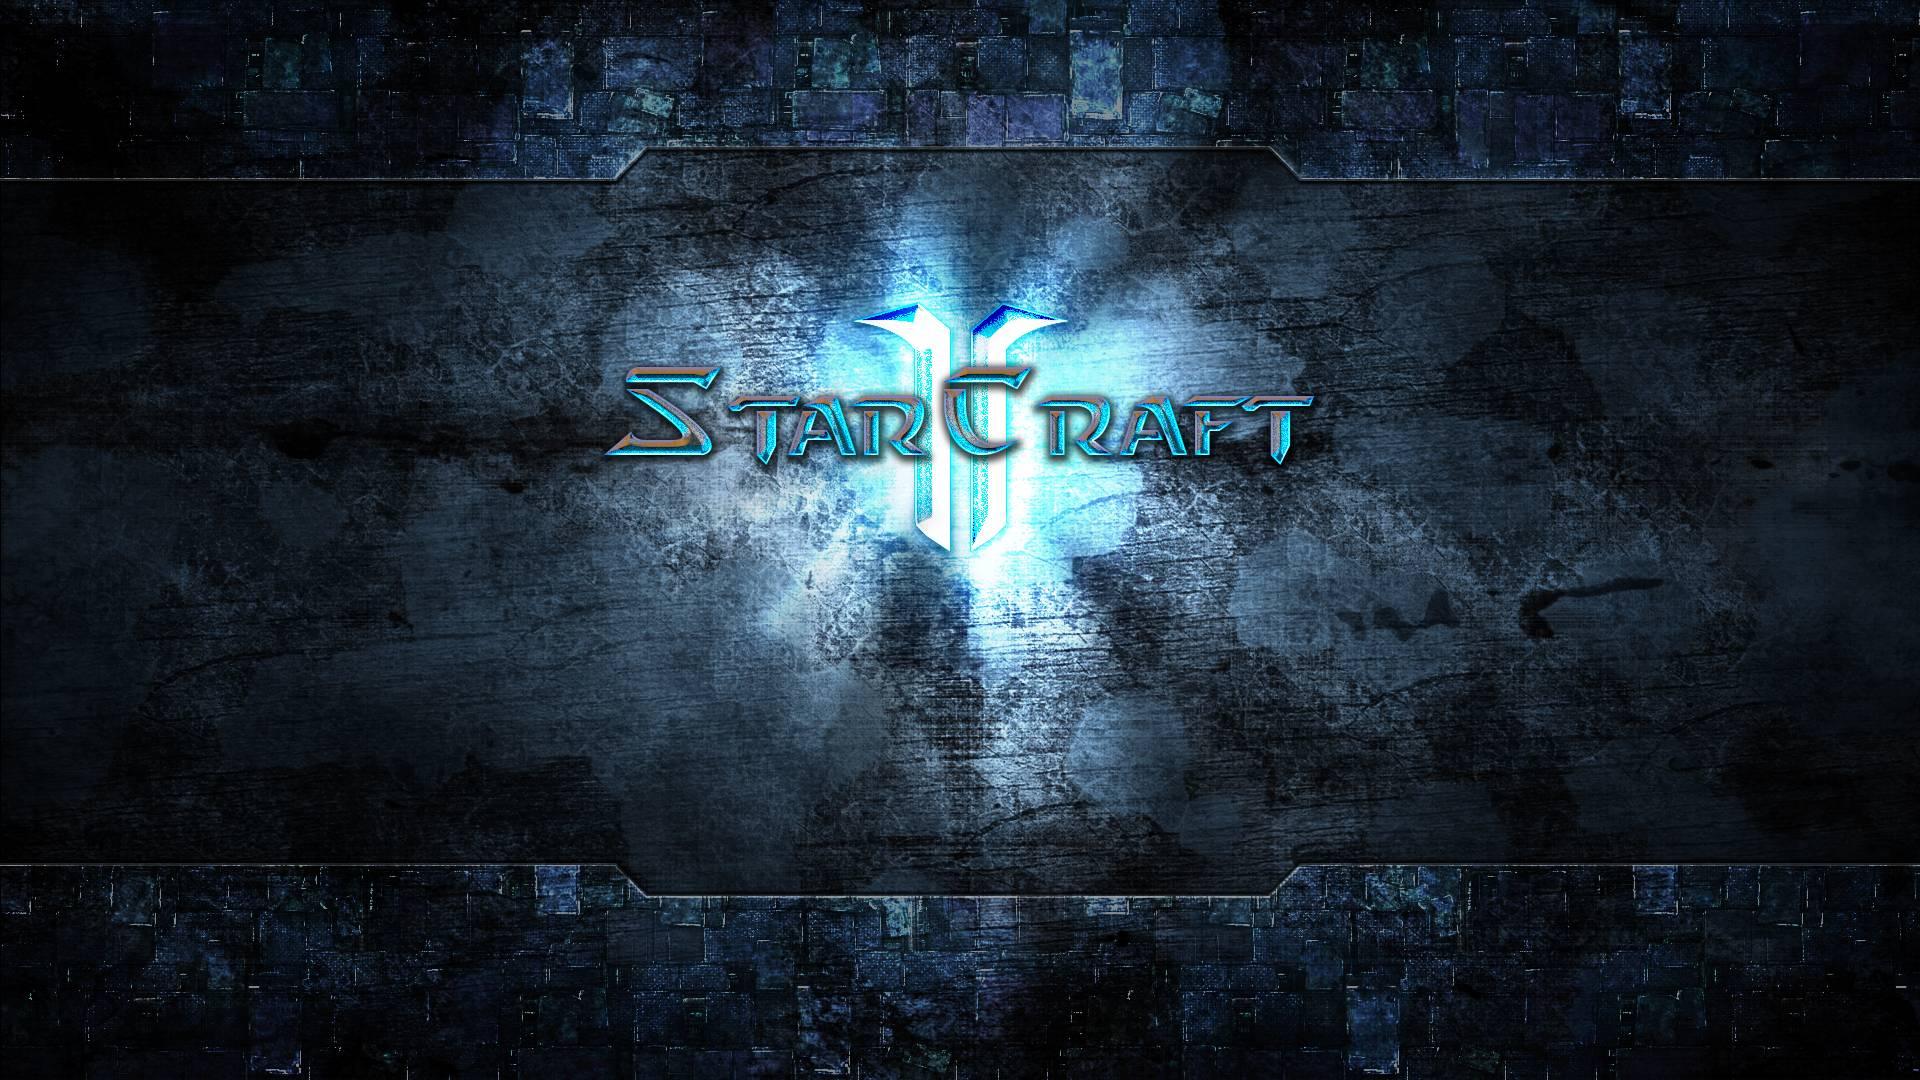 starcraft 2 wallpapers 4kx2k - photo #47